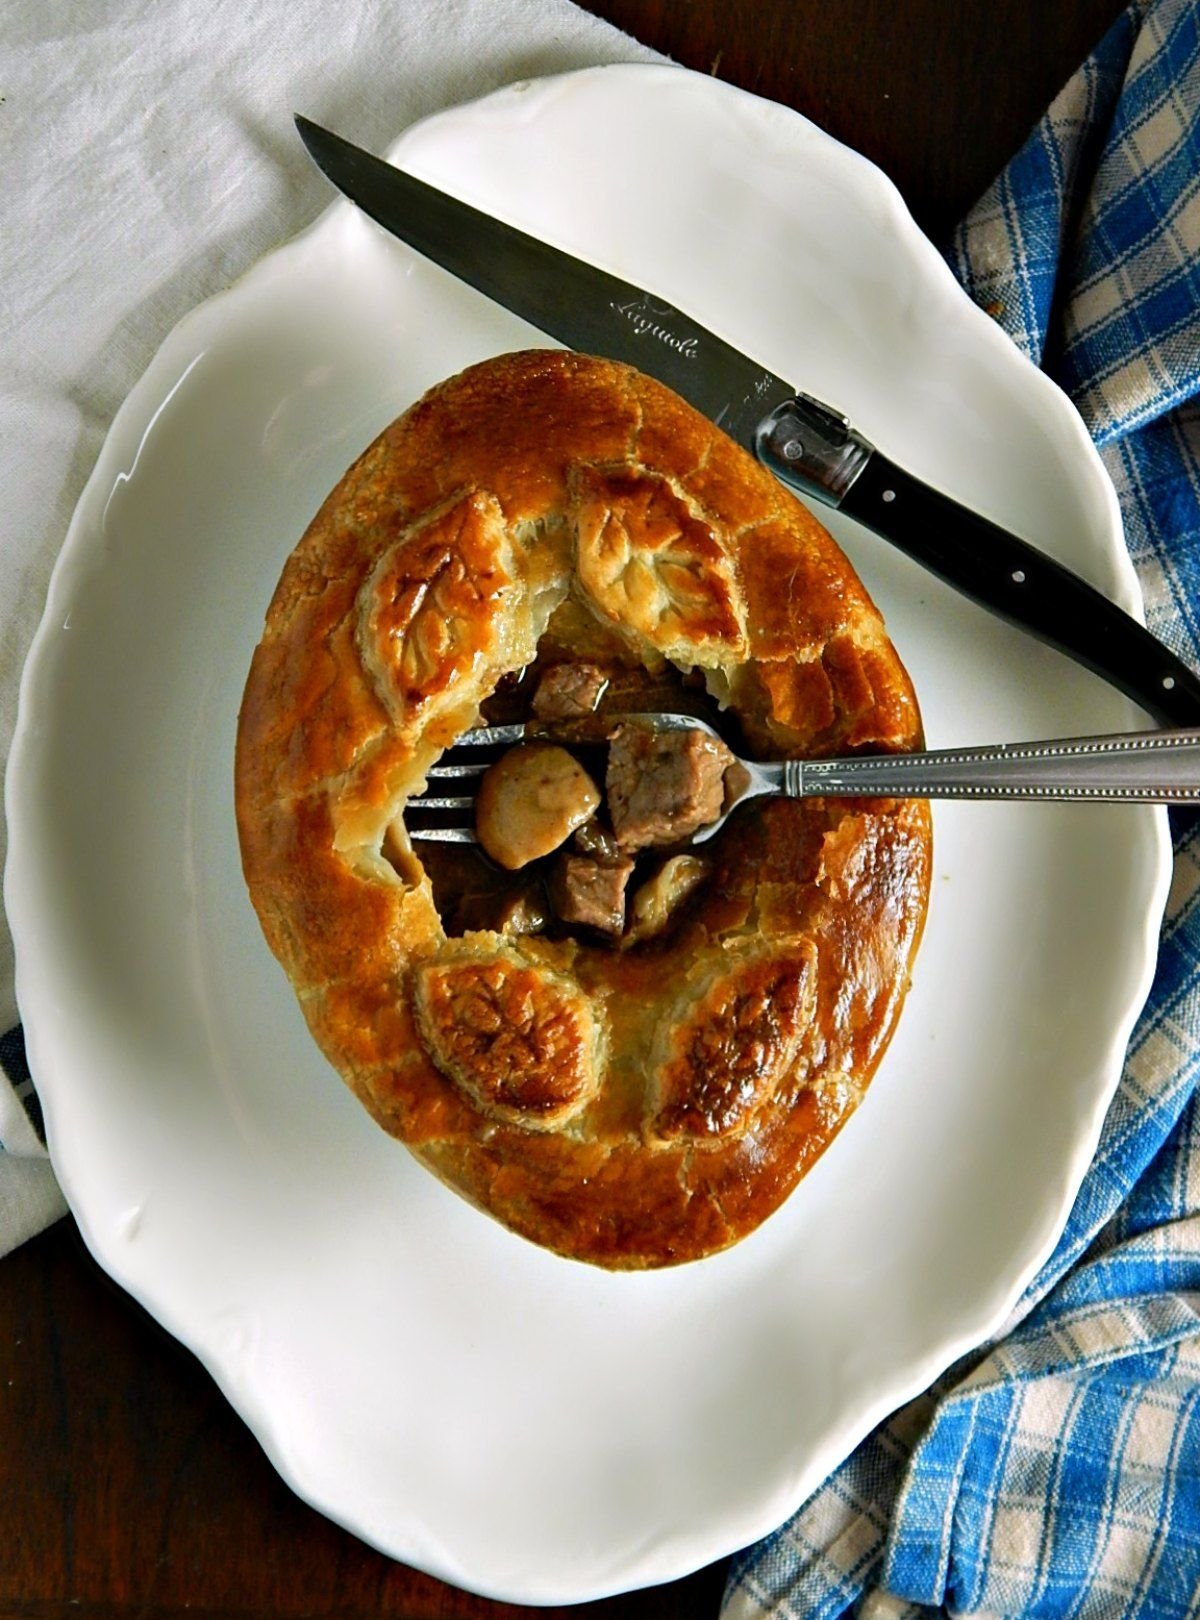 Leftover Steak & Mushroom Pies | Leftover steak, Steak and ...